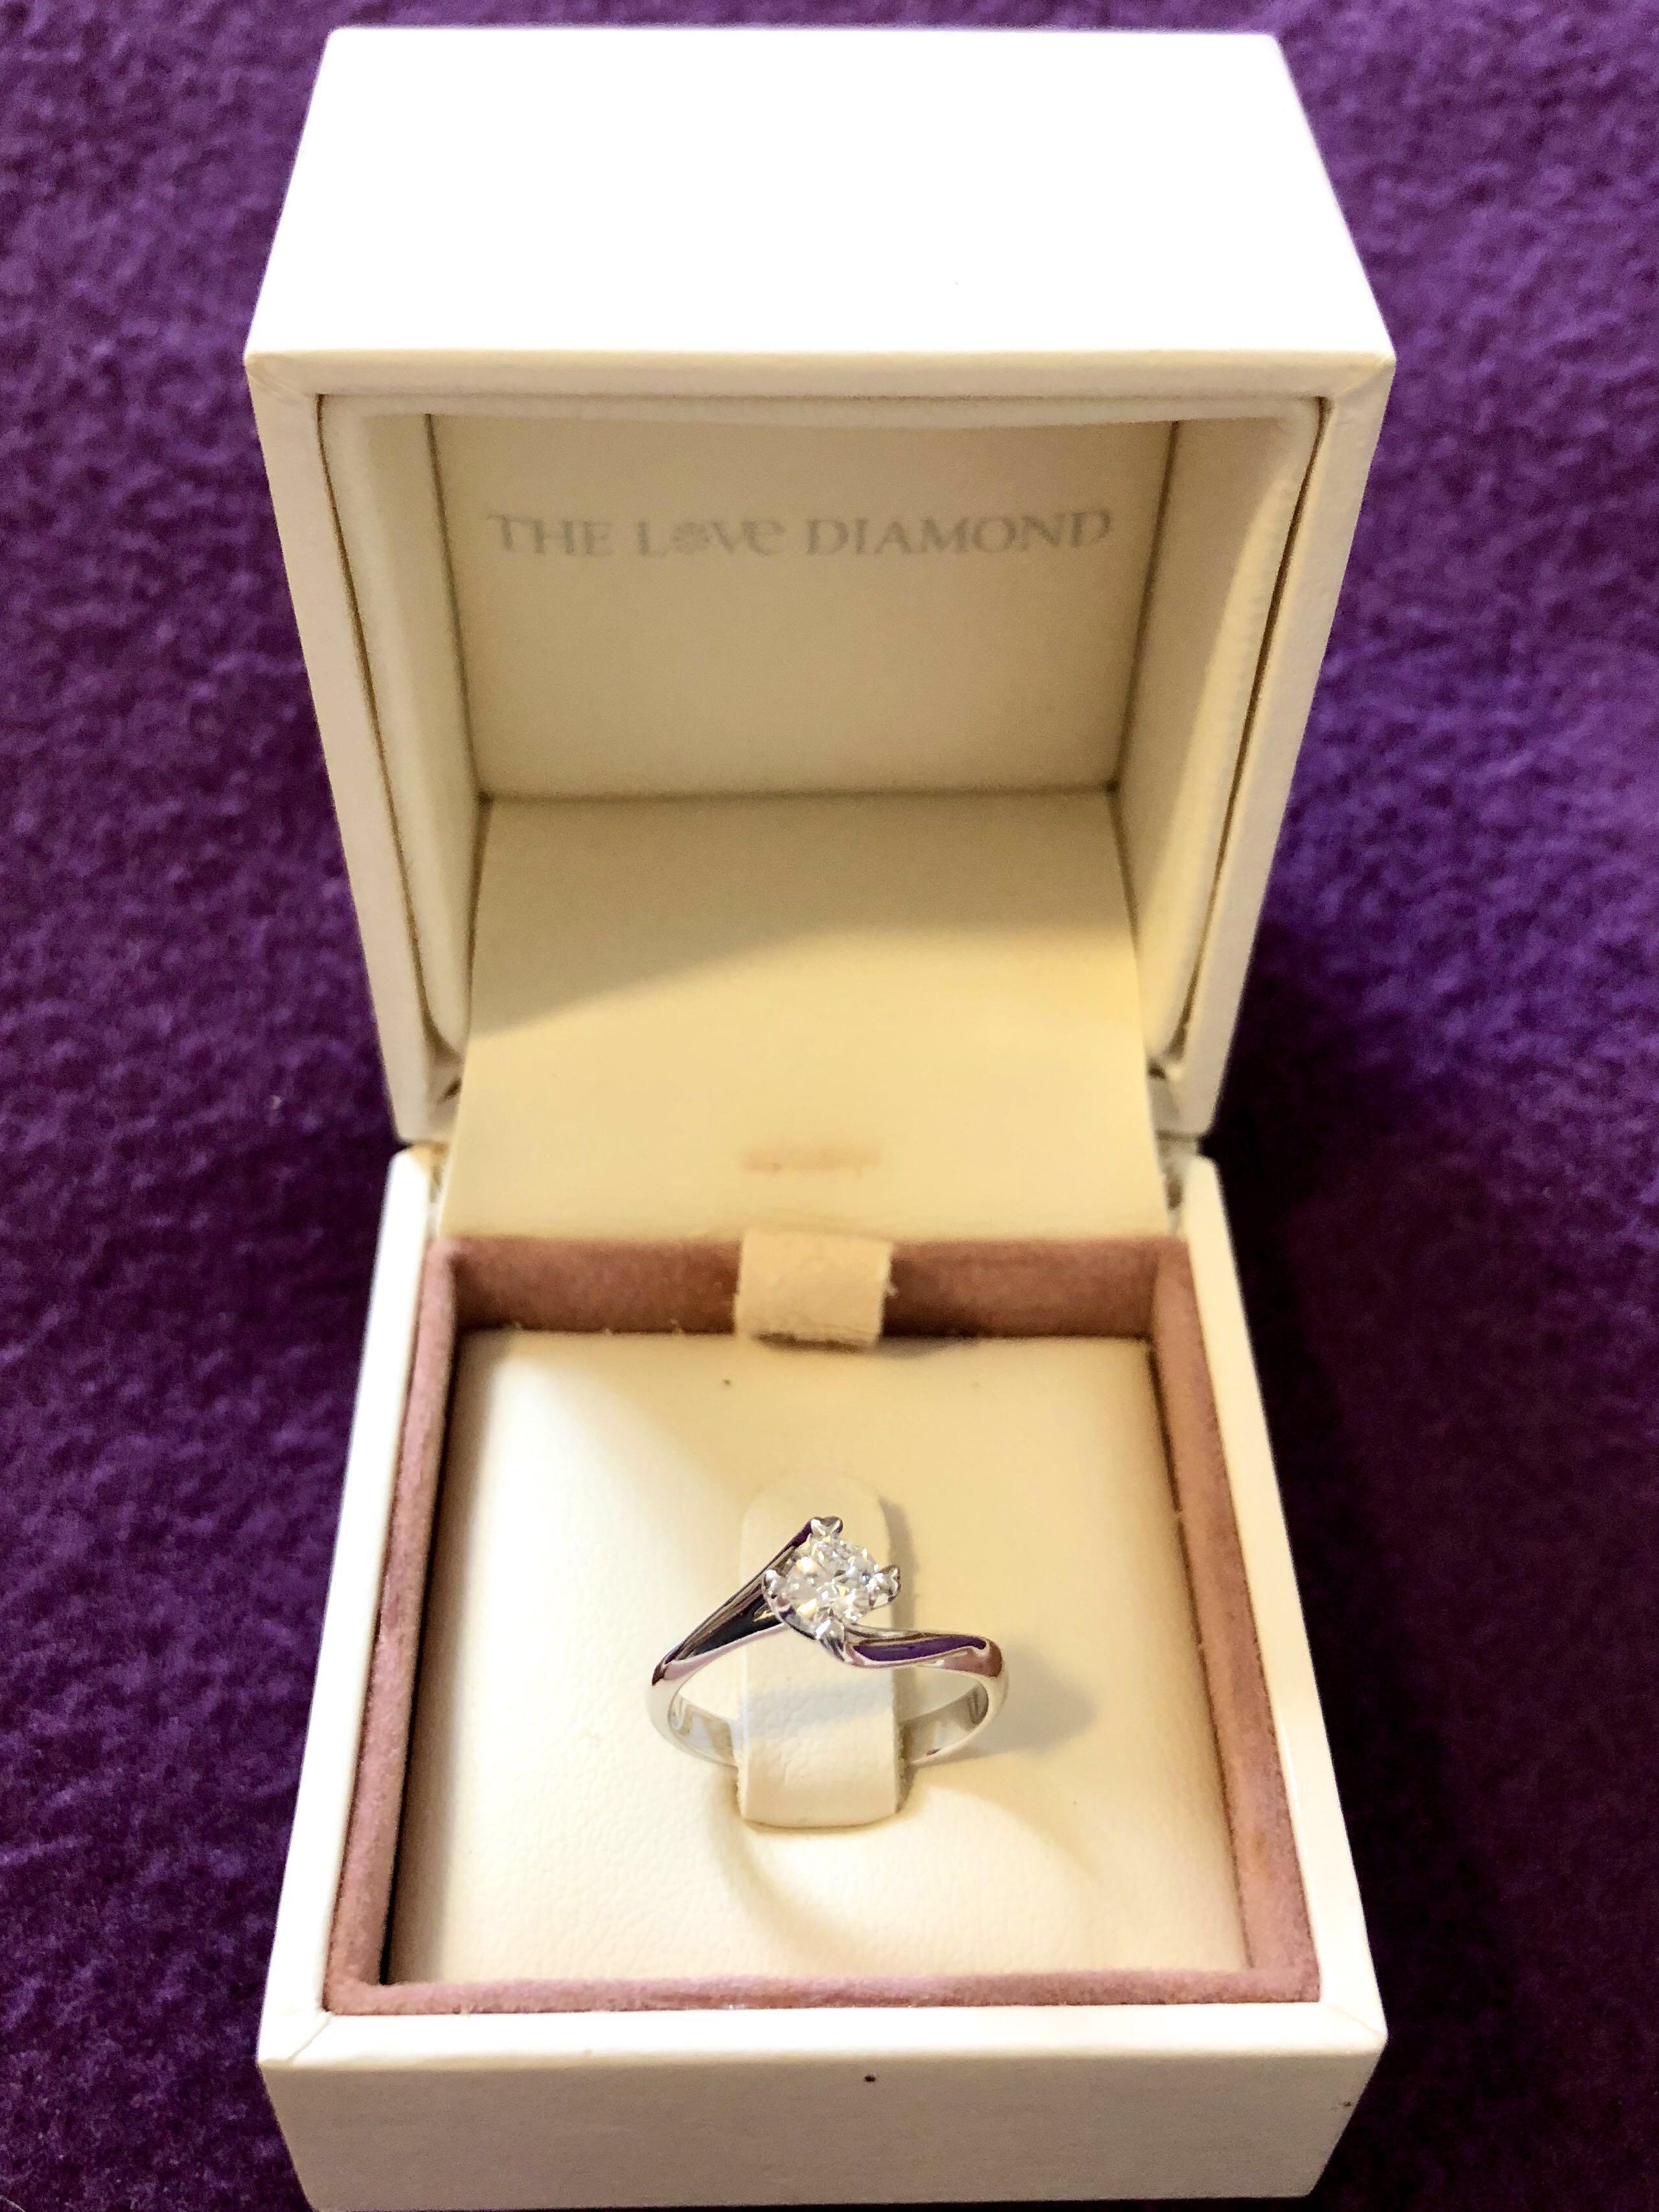 Brand New Genuine The Love Diamond Ring 028 Carat Size 8